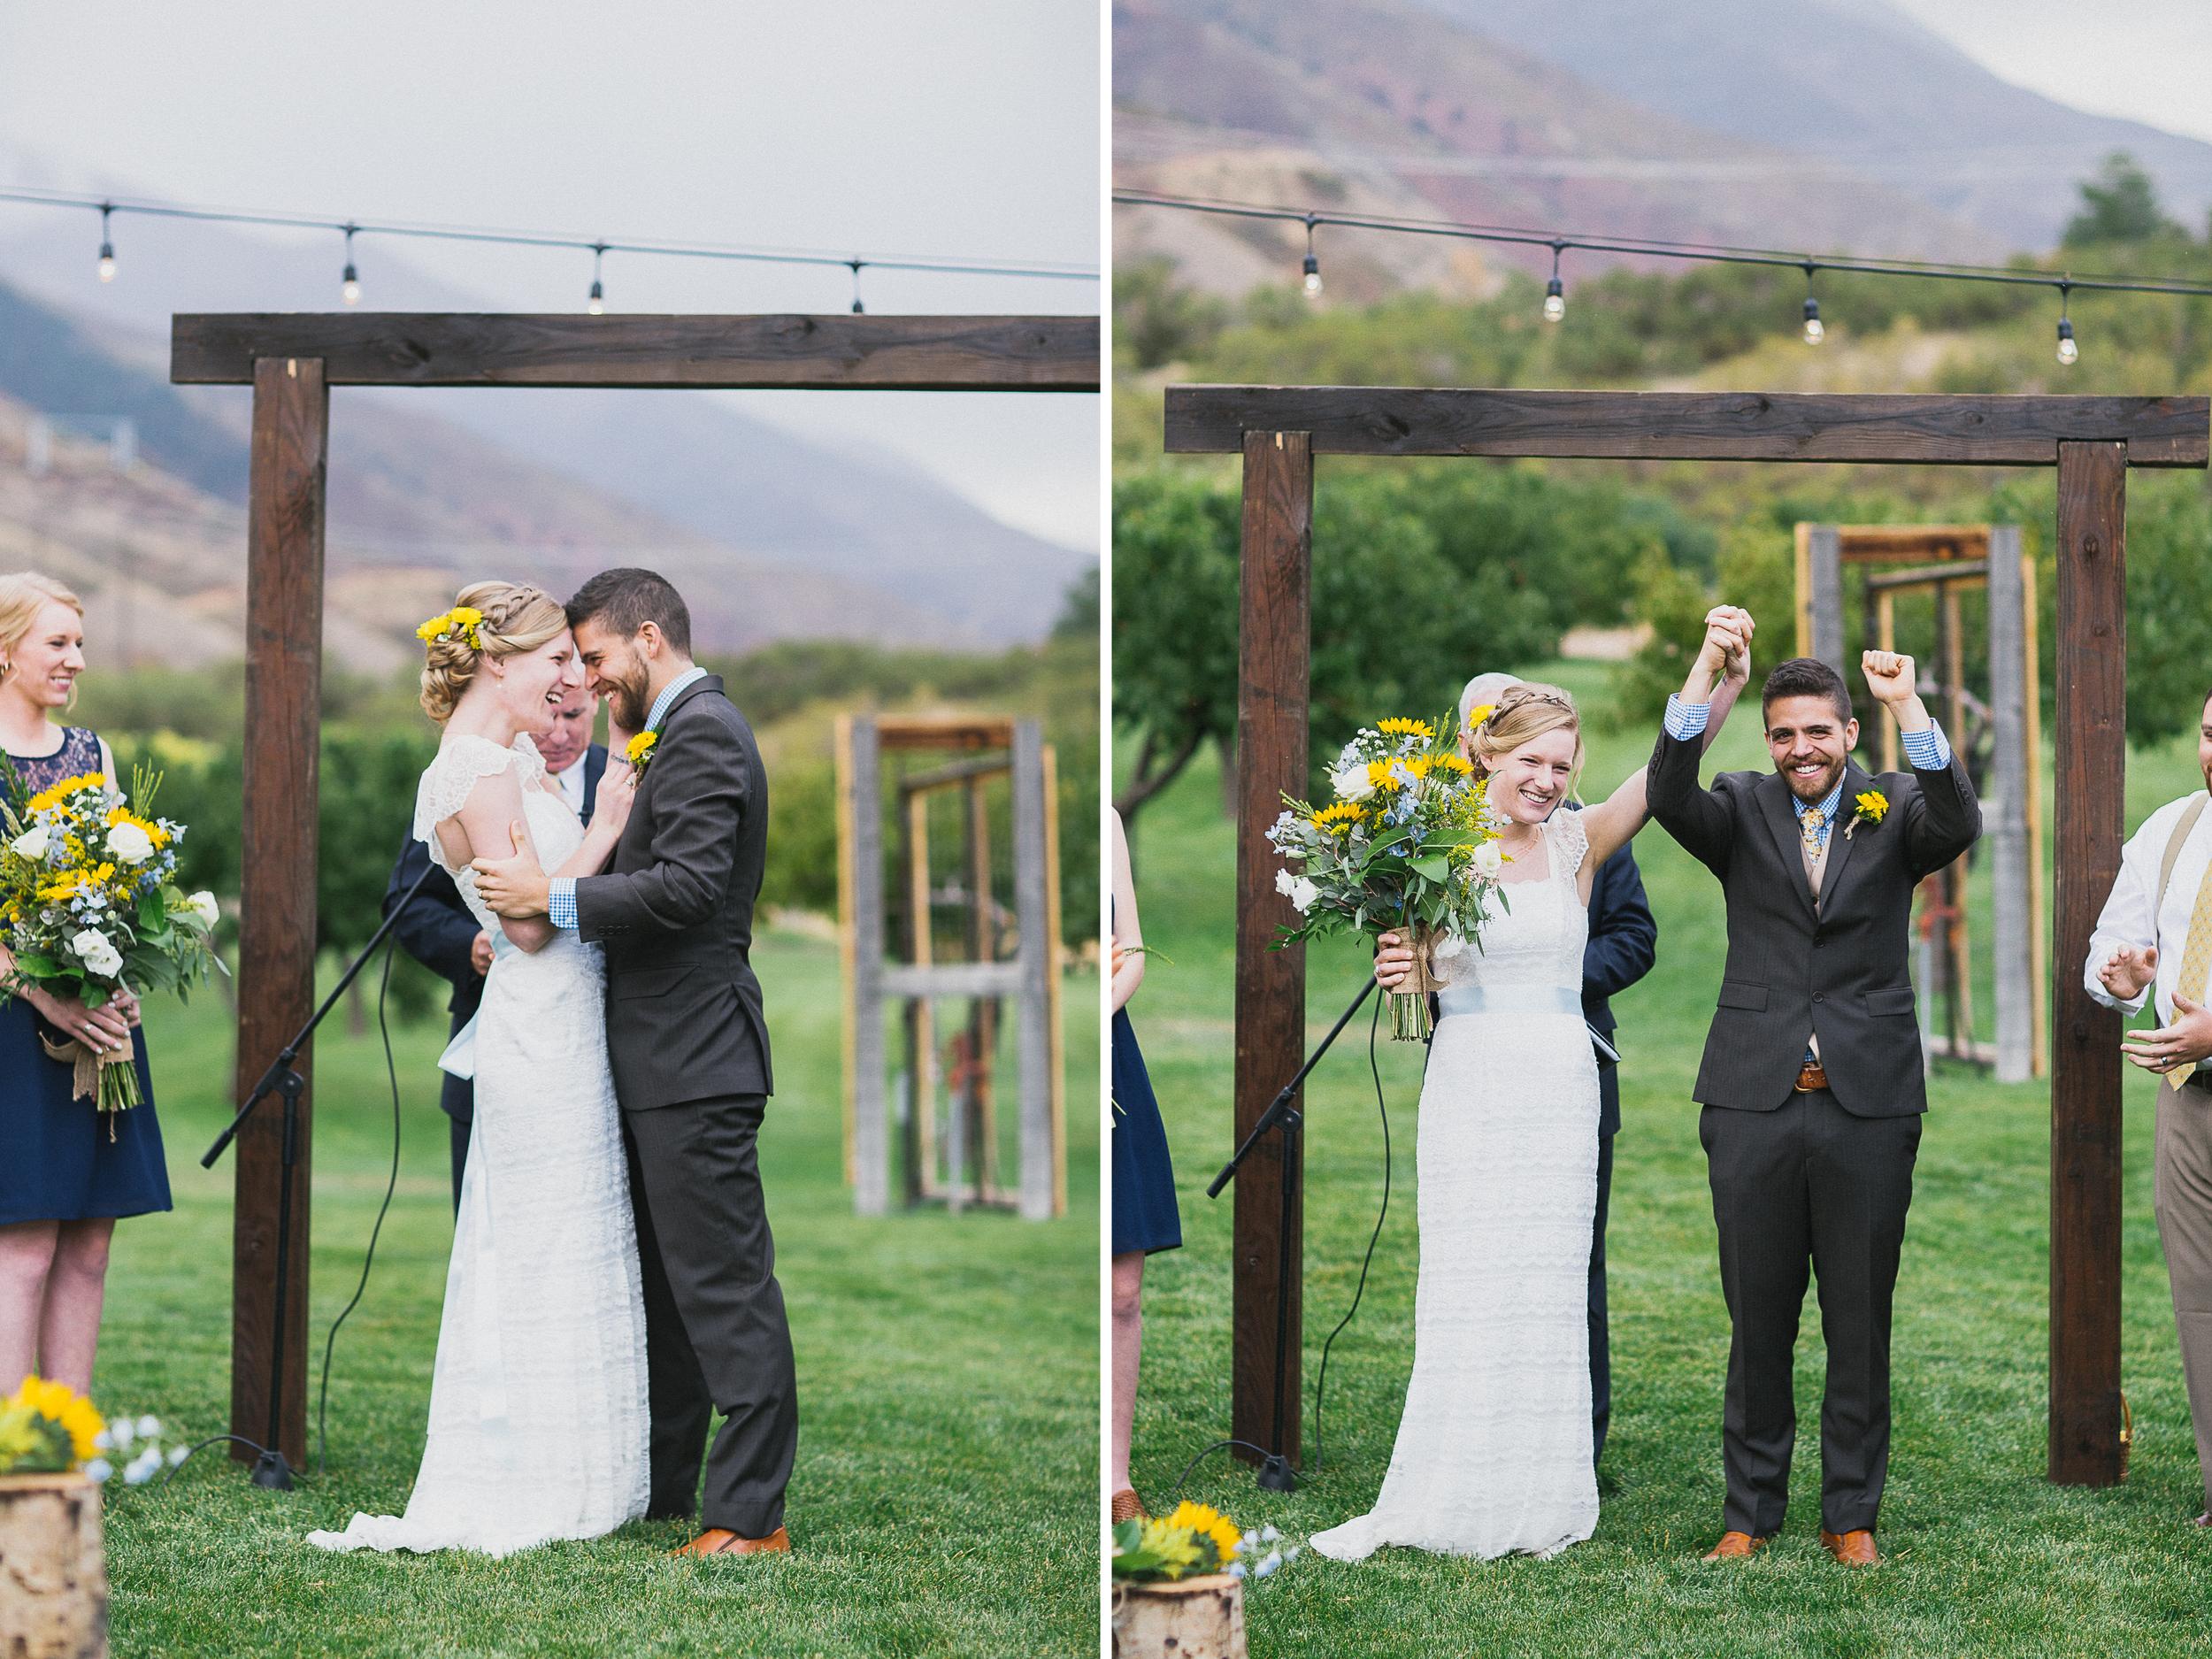 Salt-Lake-City-Wedding-Photographer-Utah-012.jpg